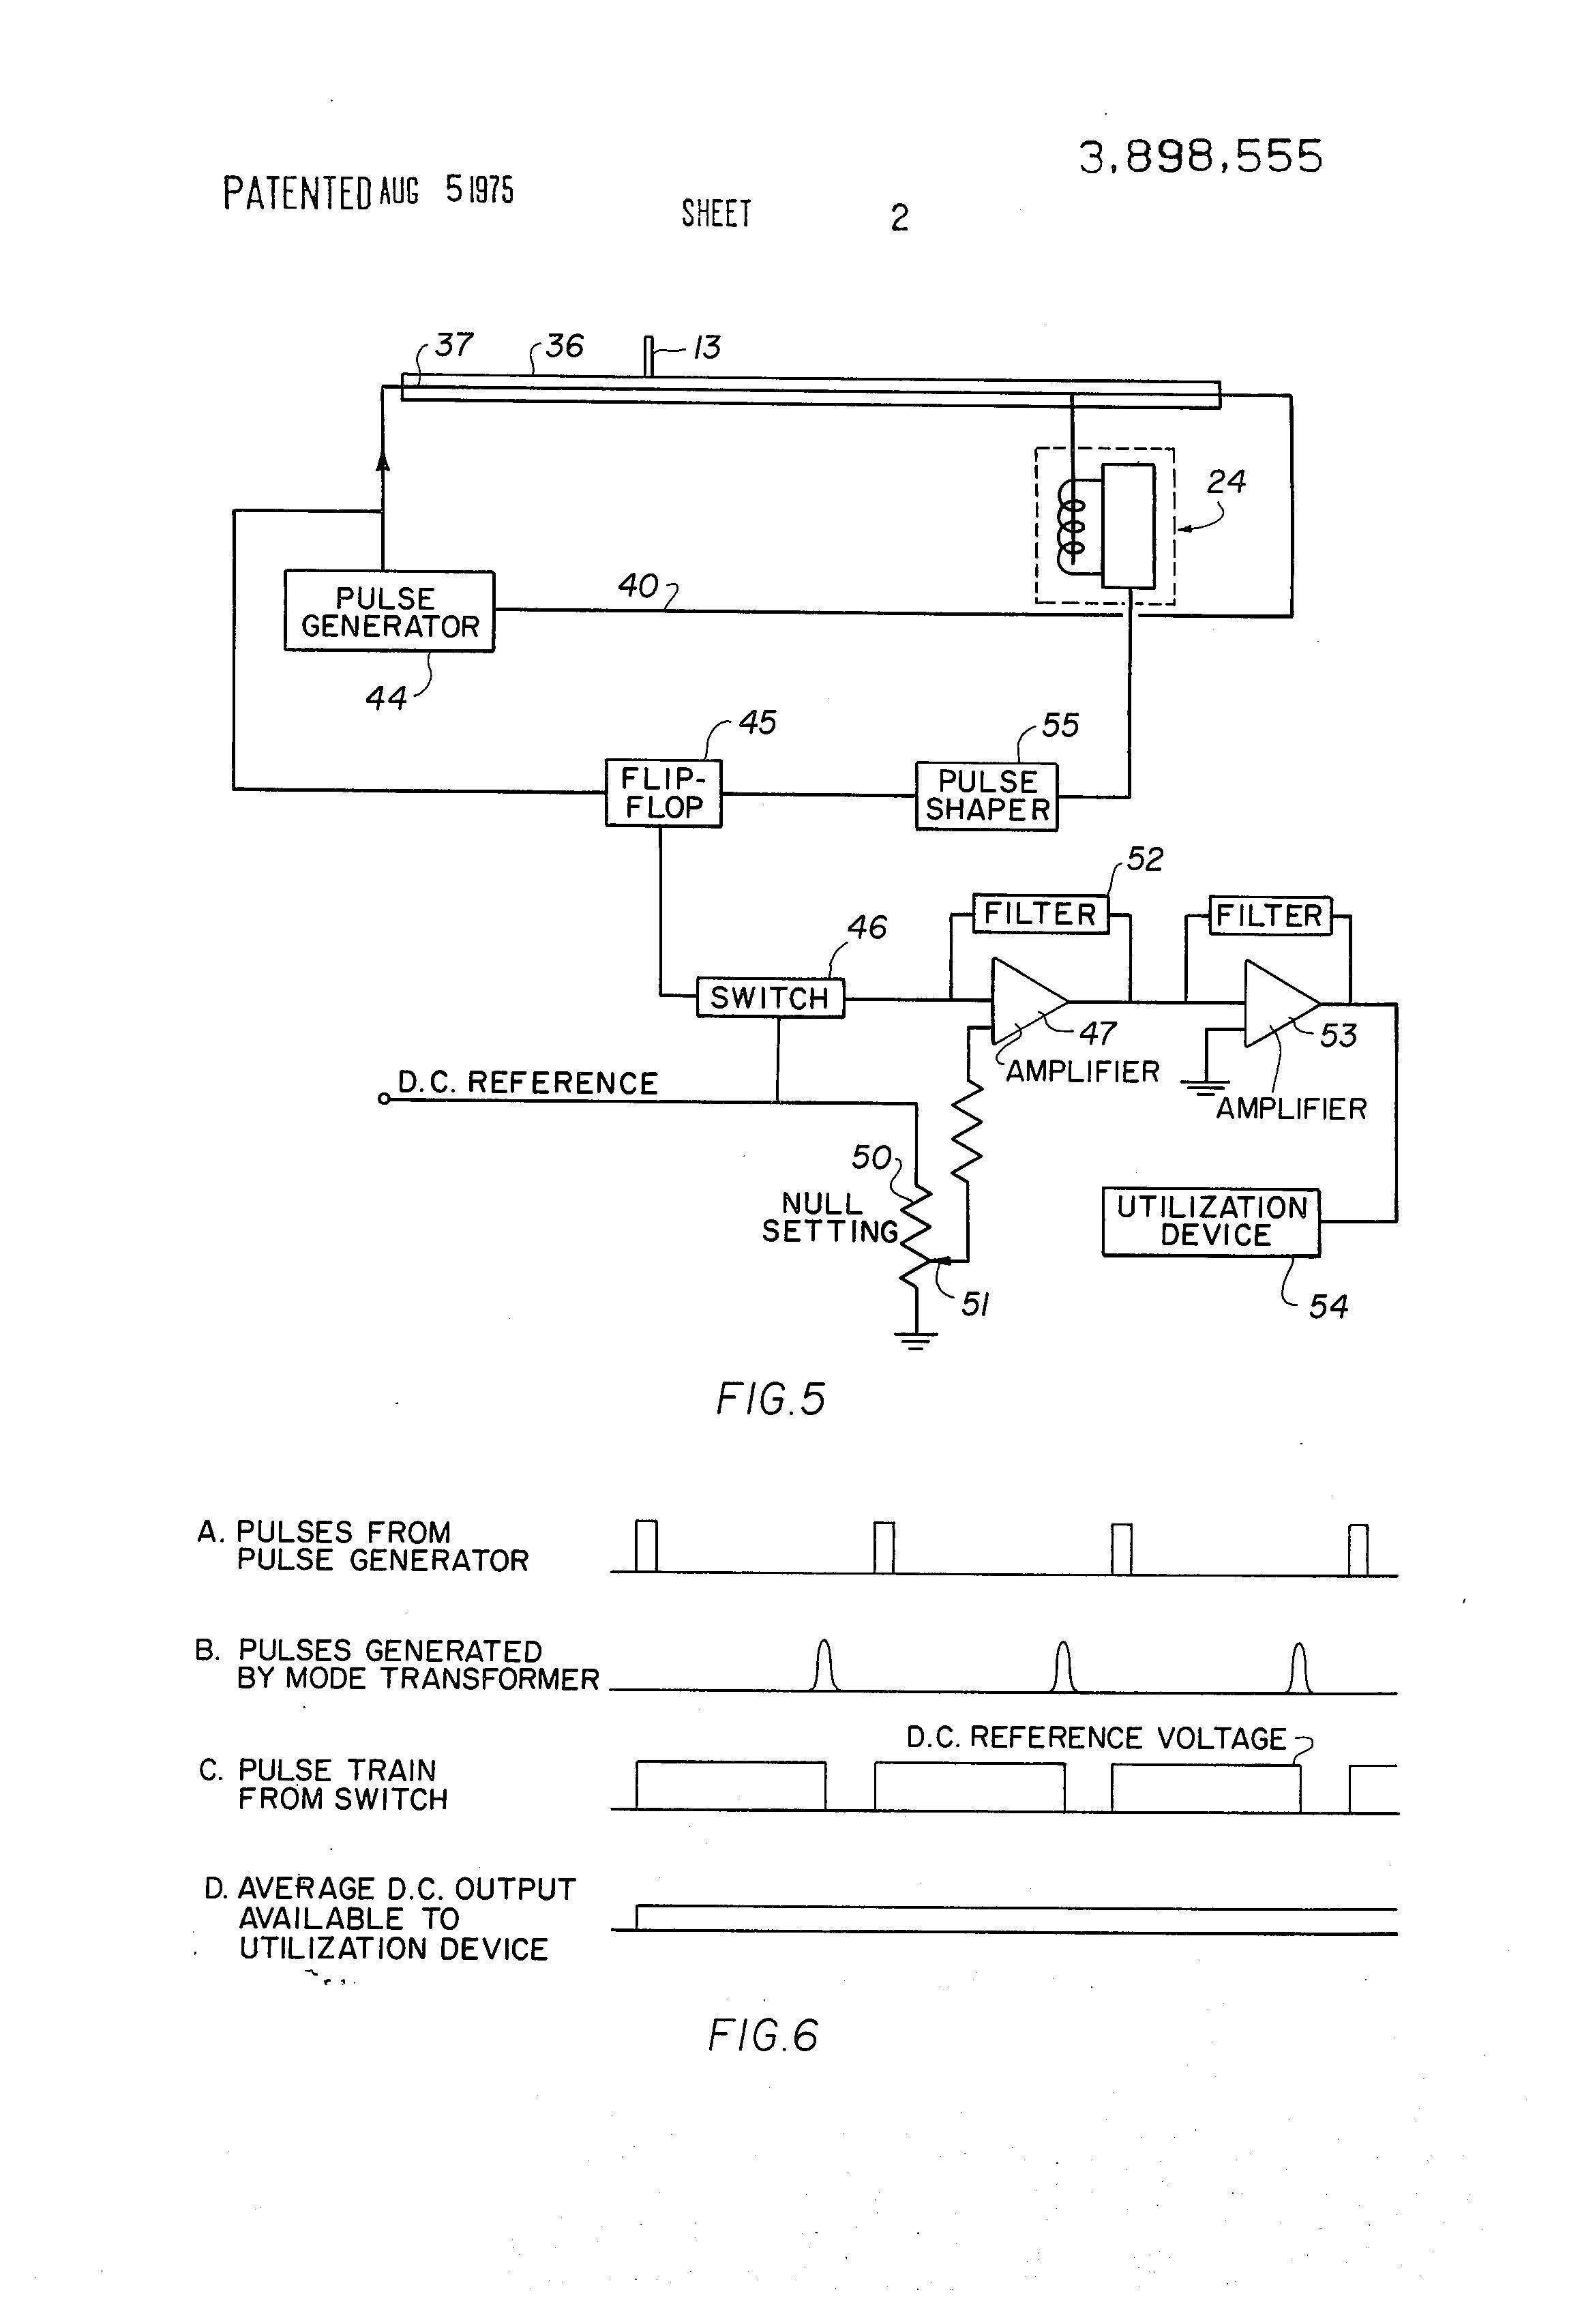 Temposonic position transducer